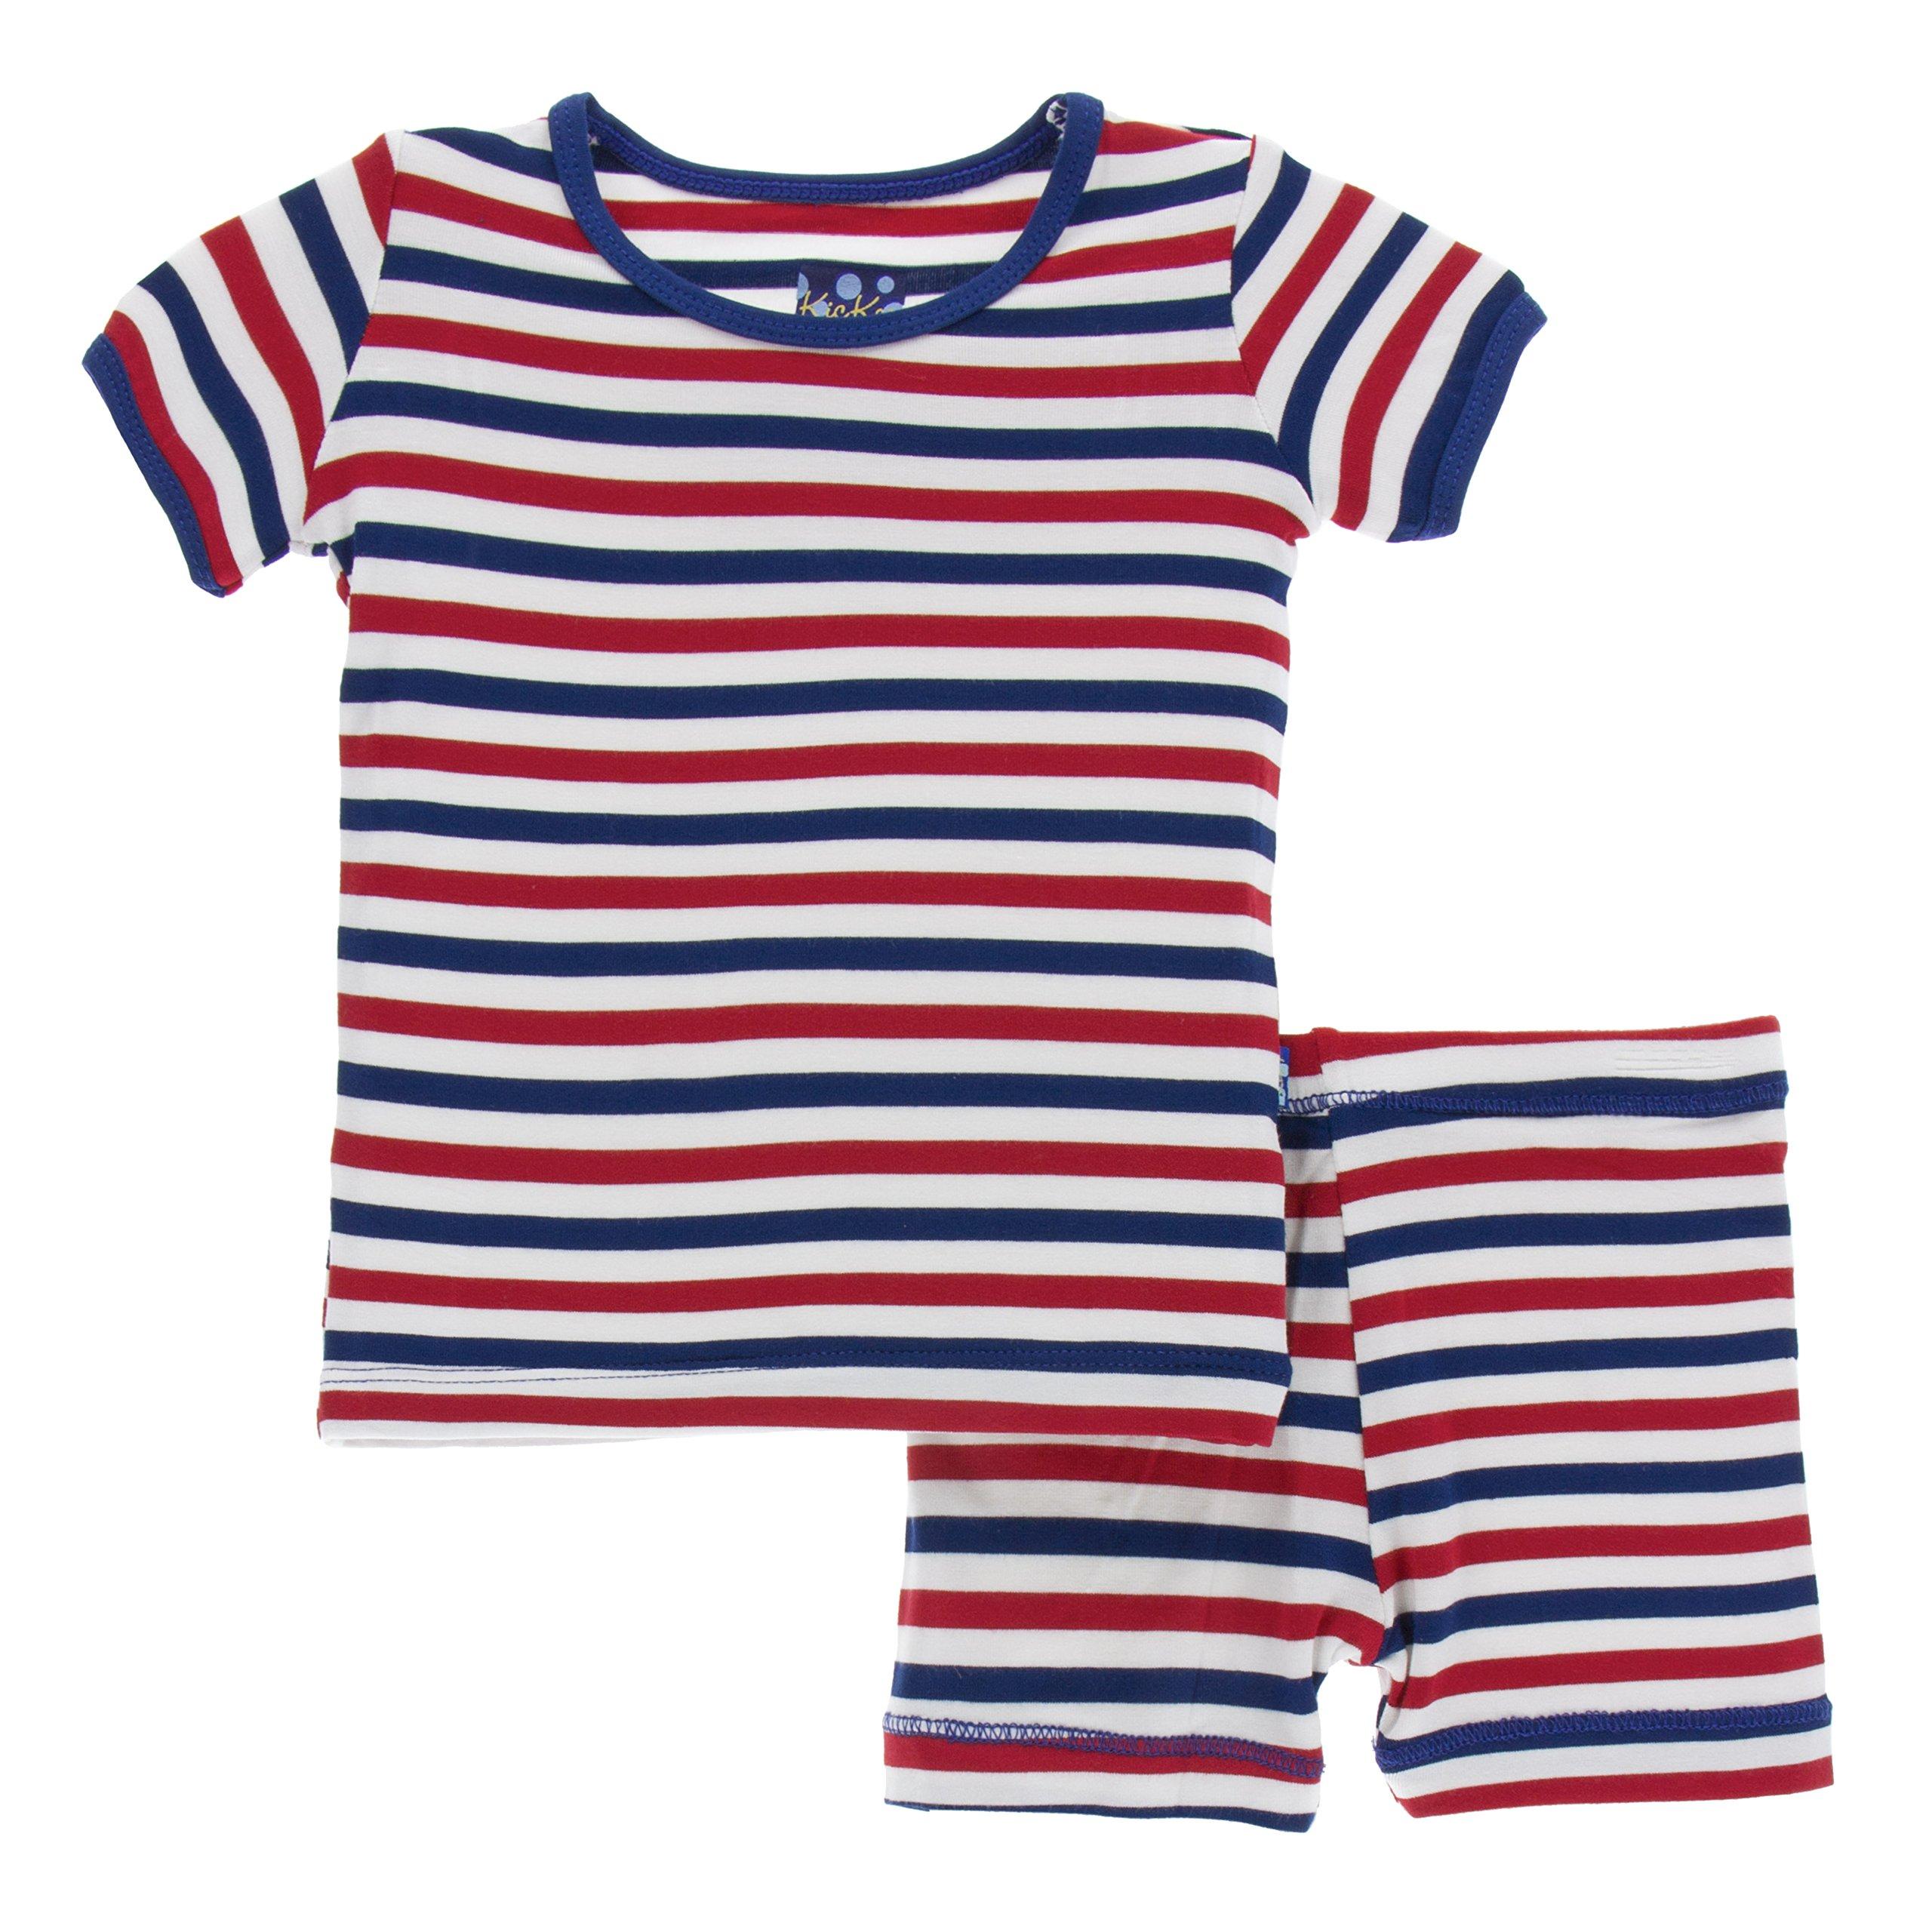 54529dc87 Kickee Pants Little Boys Print Short Sleeve Pajama Set With Shorts ...